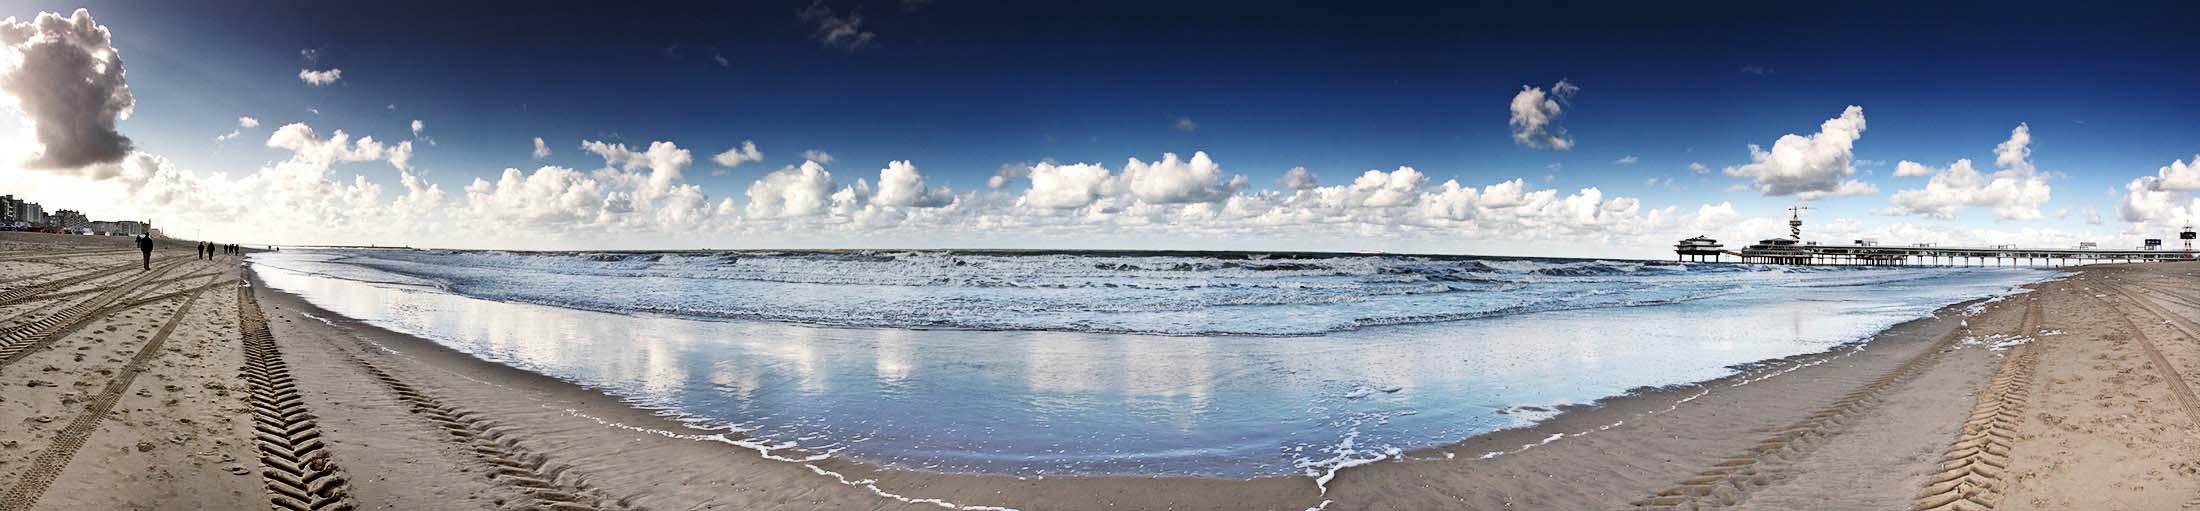 Atlantic-coast-Seveningen-Den-Haag